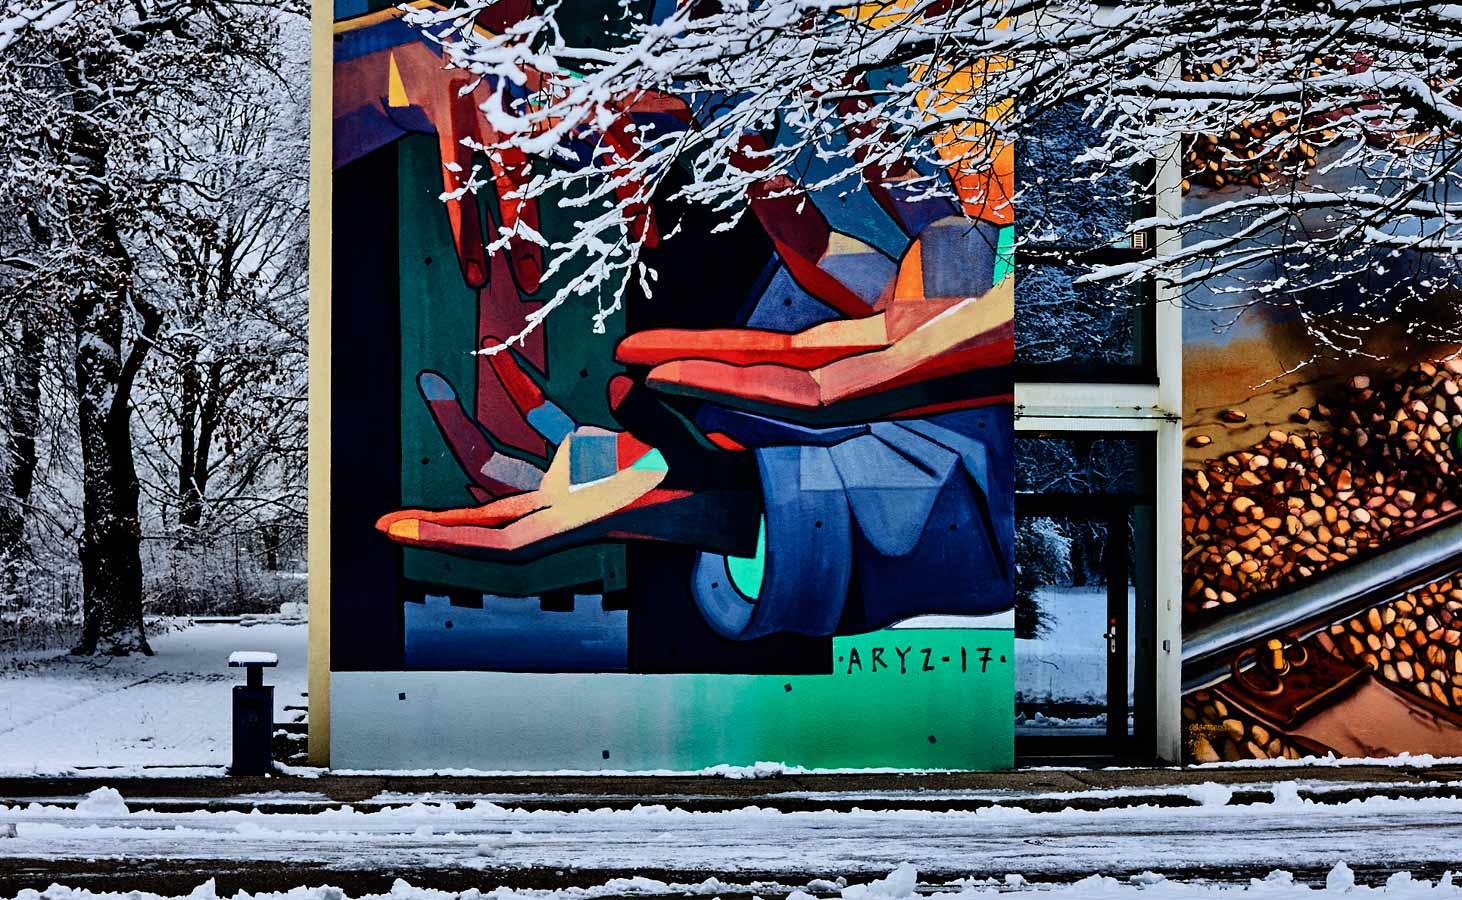 Scale-Street-Art-Siemens-Gelaende-Muenchen-2017--7